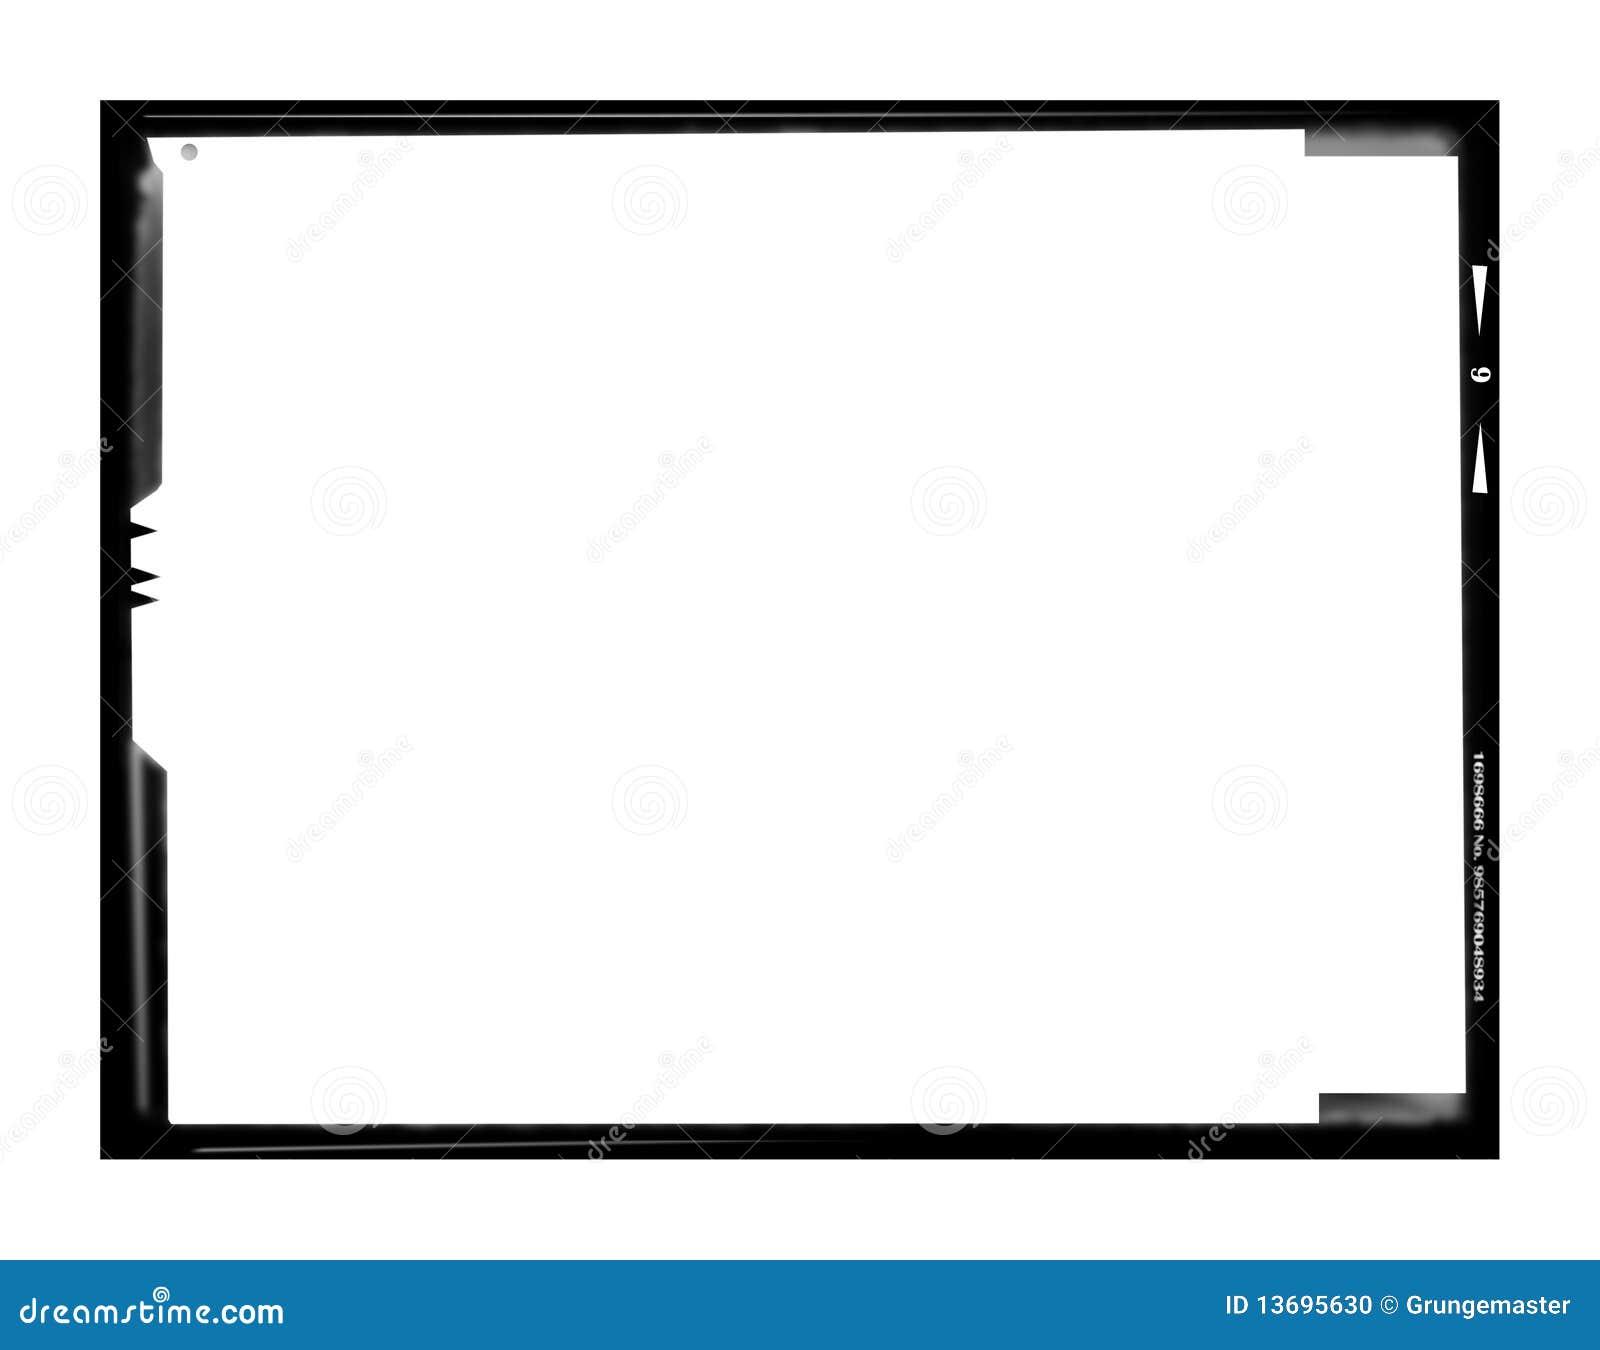 Large format negative picture frame